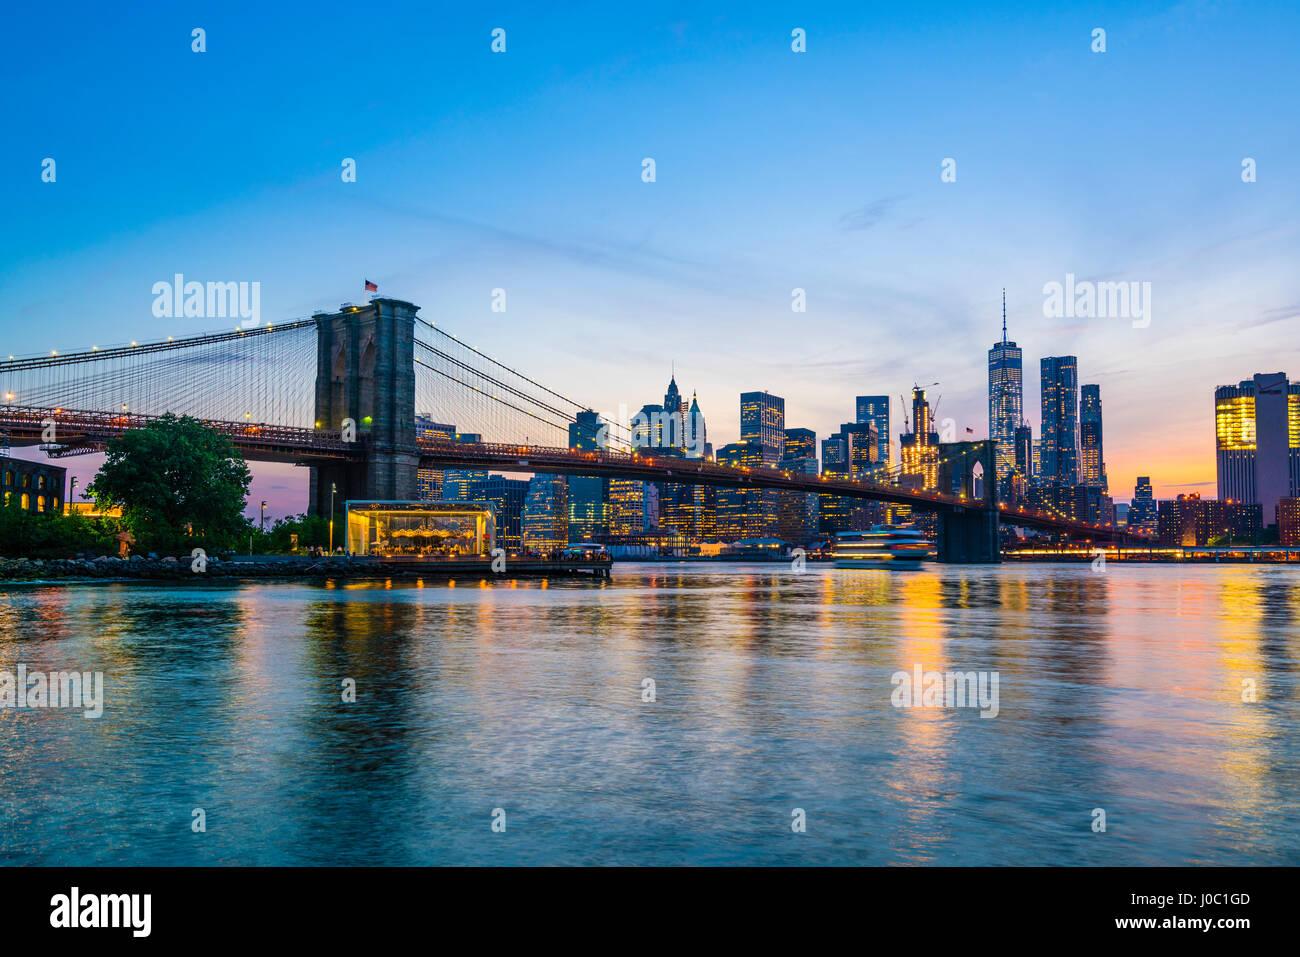 Pont de Brooklyn et Manhattan skyline at Dusk, vue de l'East River, New York City, USA Photo Stock